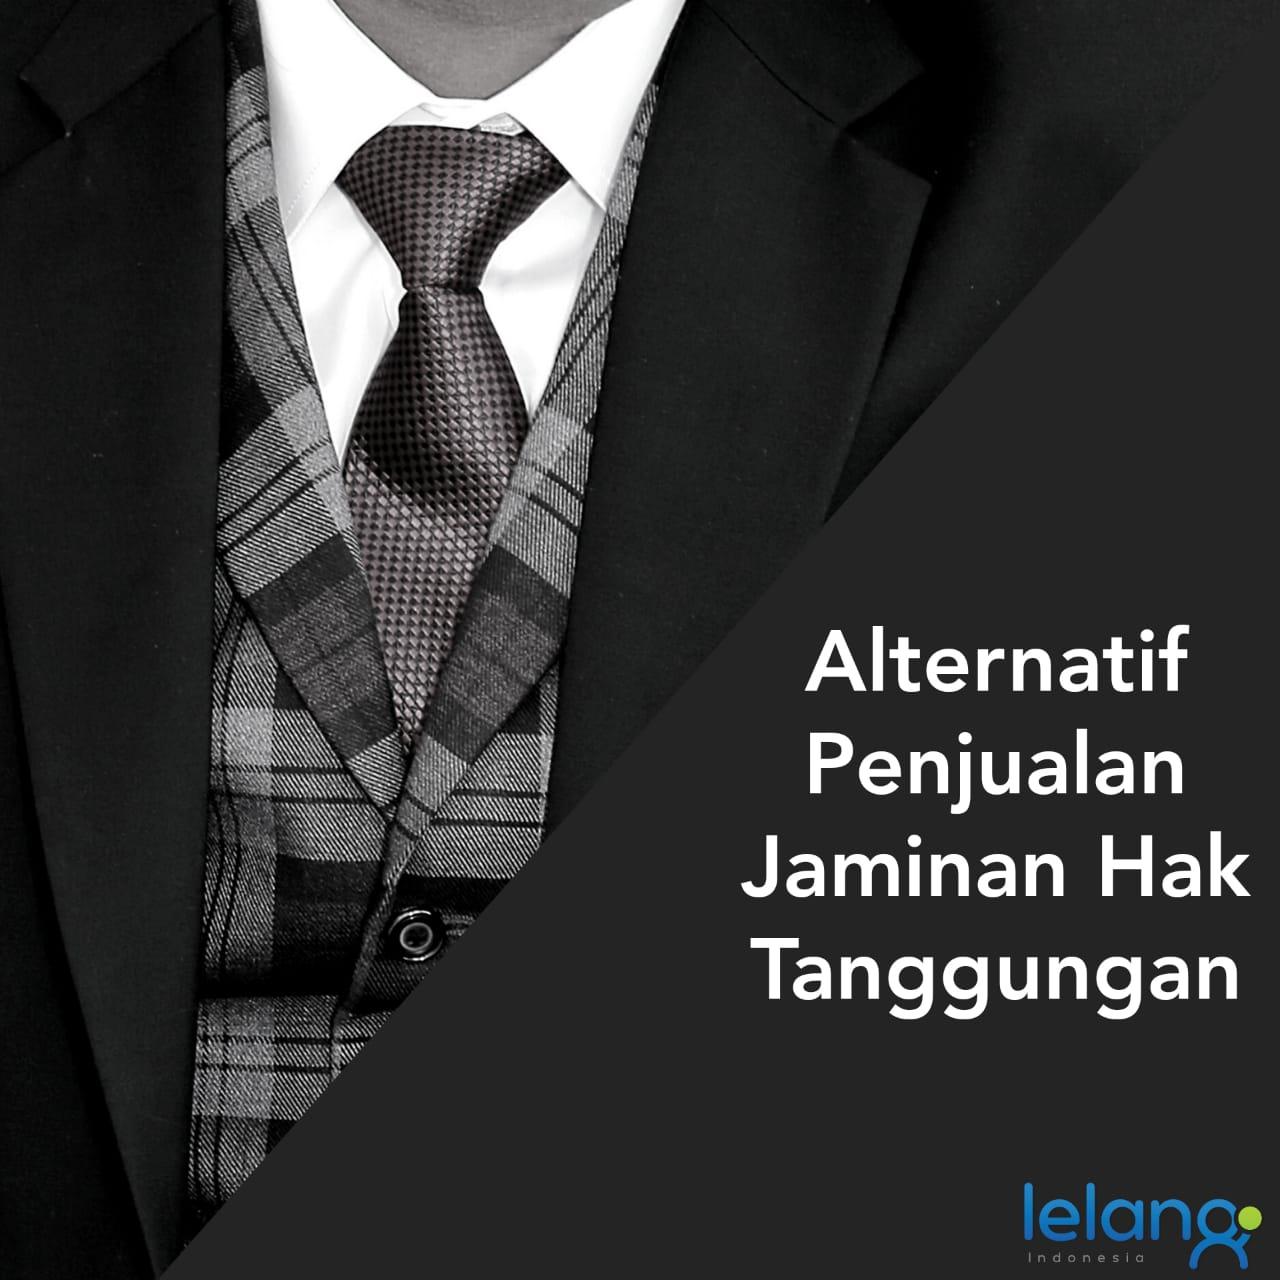 Lelang Non Eksekusi Sukarela Sebagai Salah Satu Alternatif Untuk Penjualan Jaminan Hak Tangggungan, Mungkinkah?